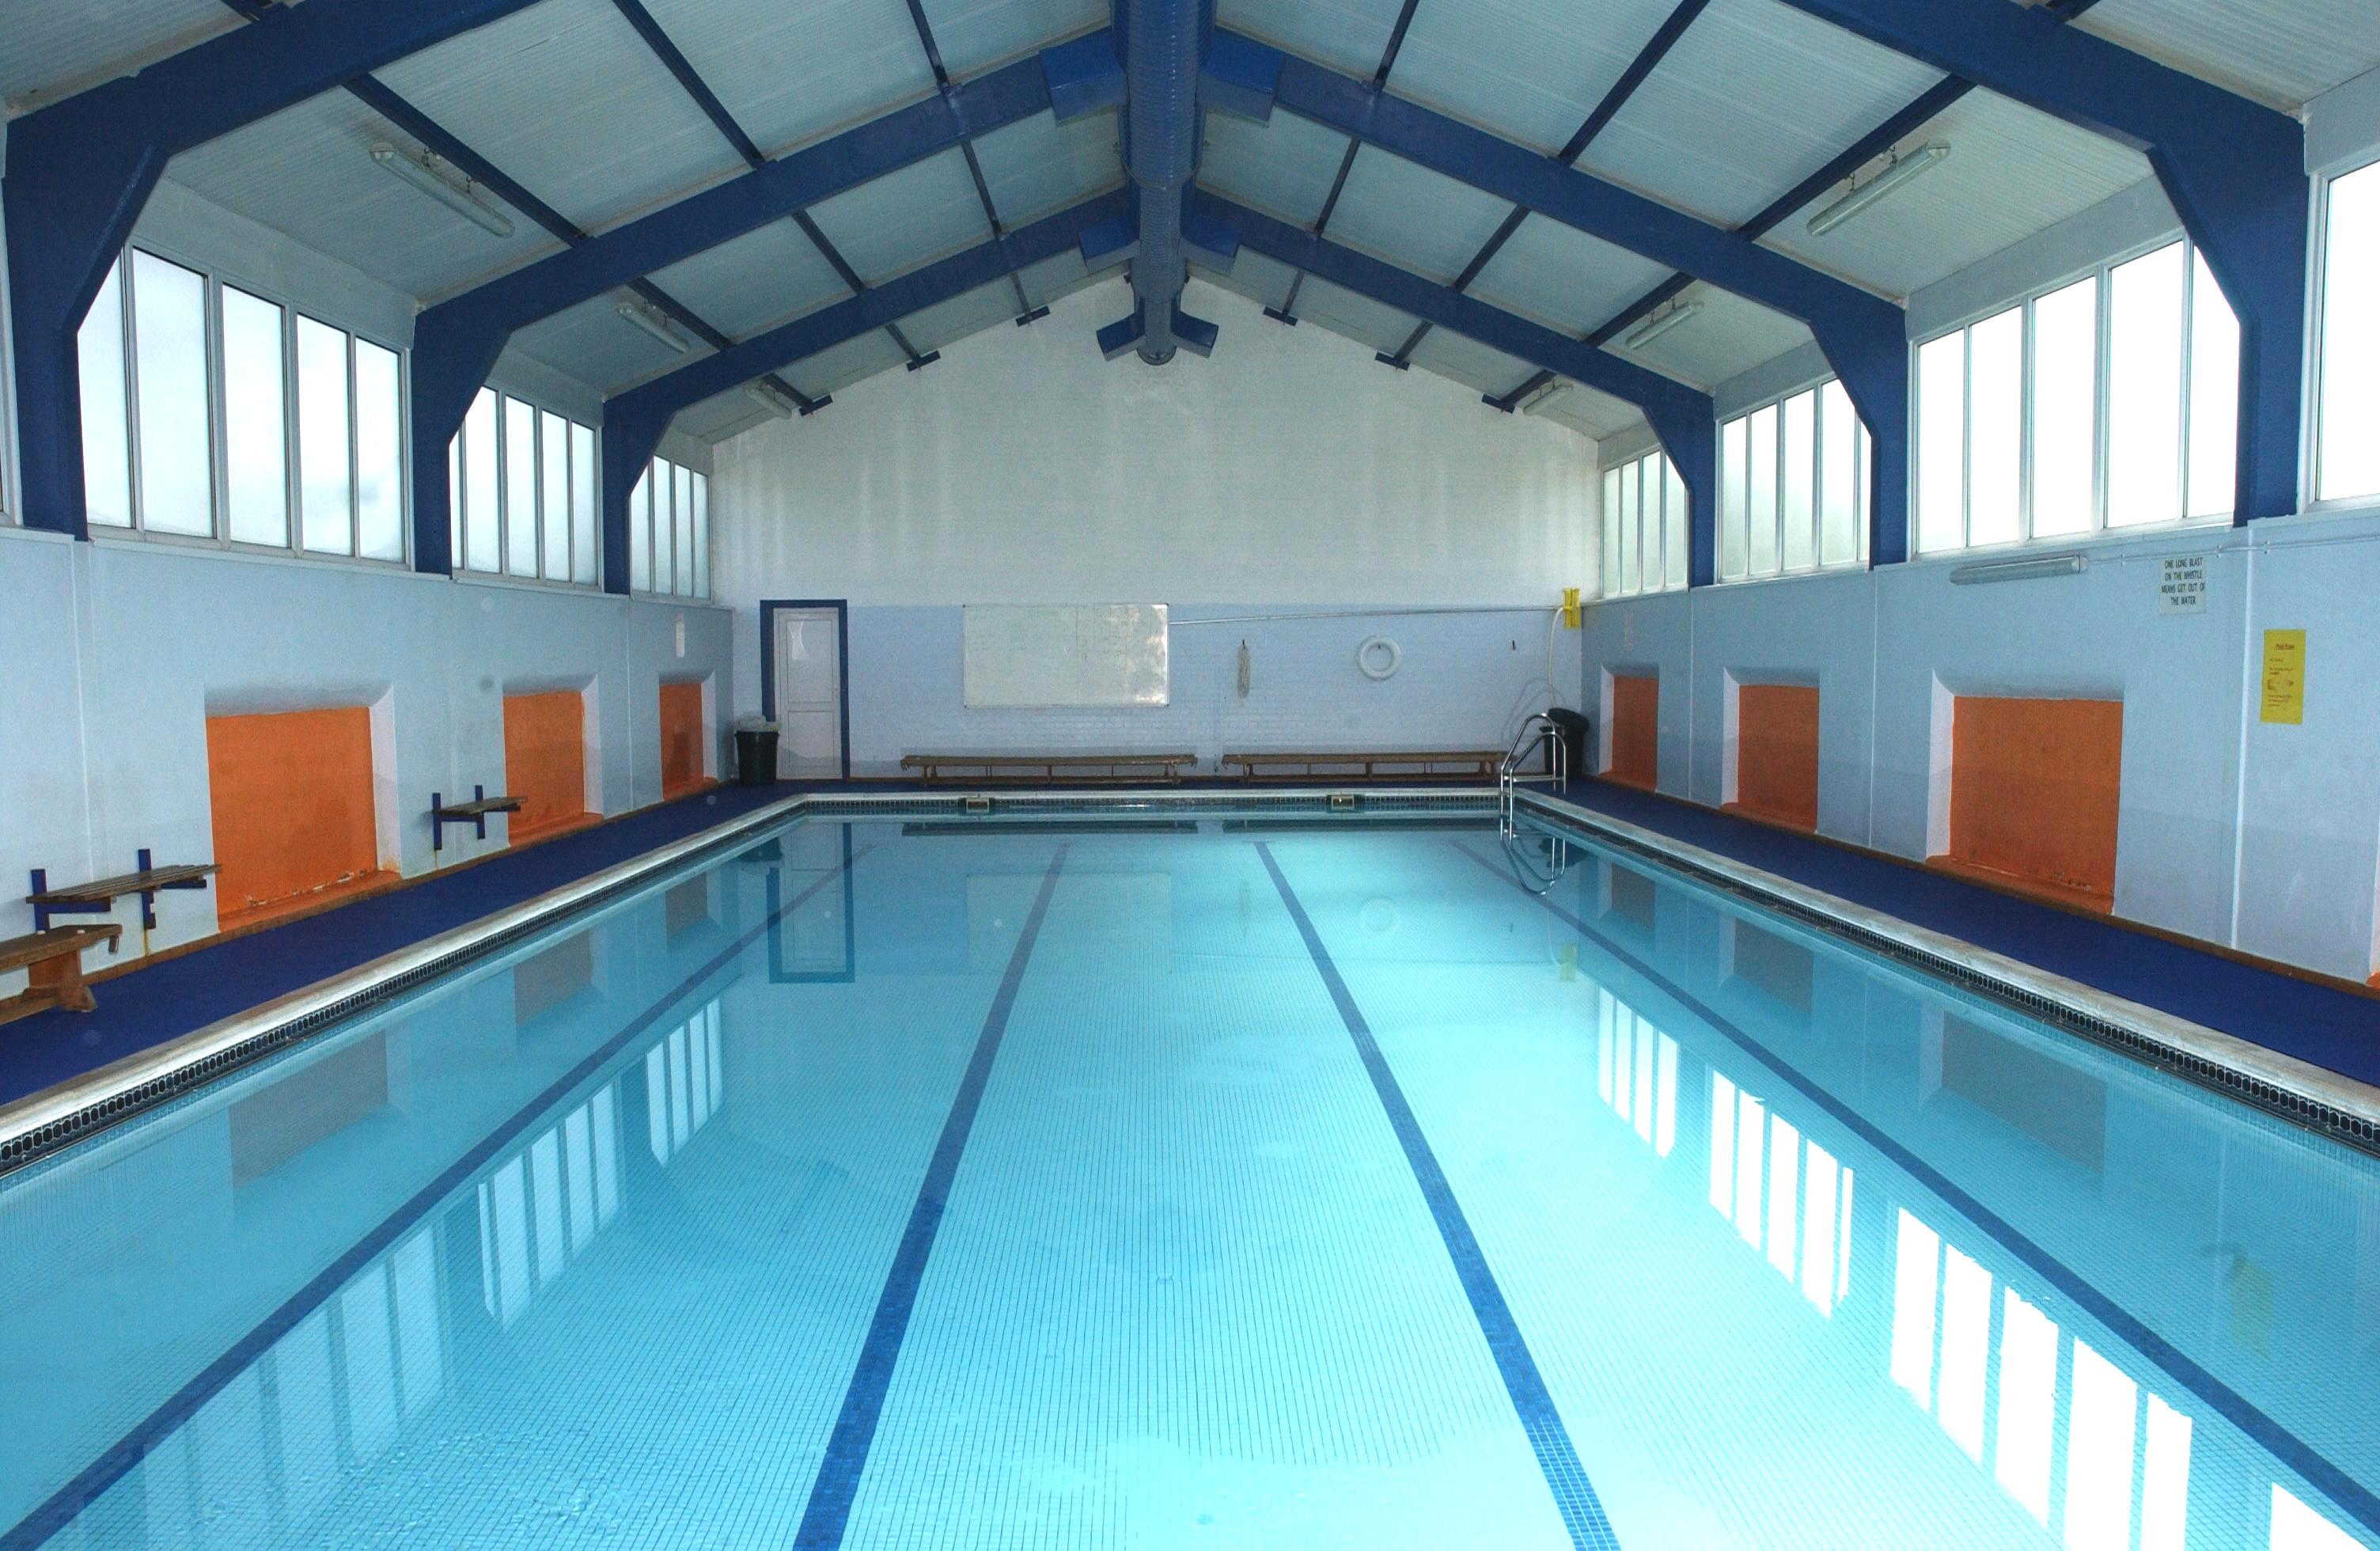 chelmsford county high school for girls d s swim school